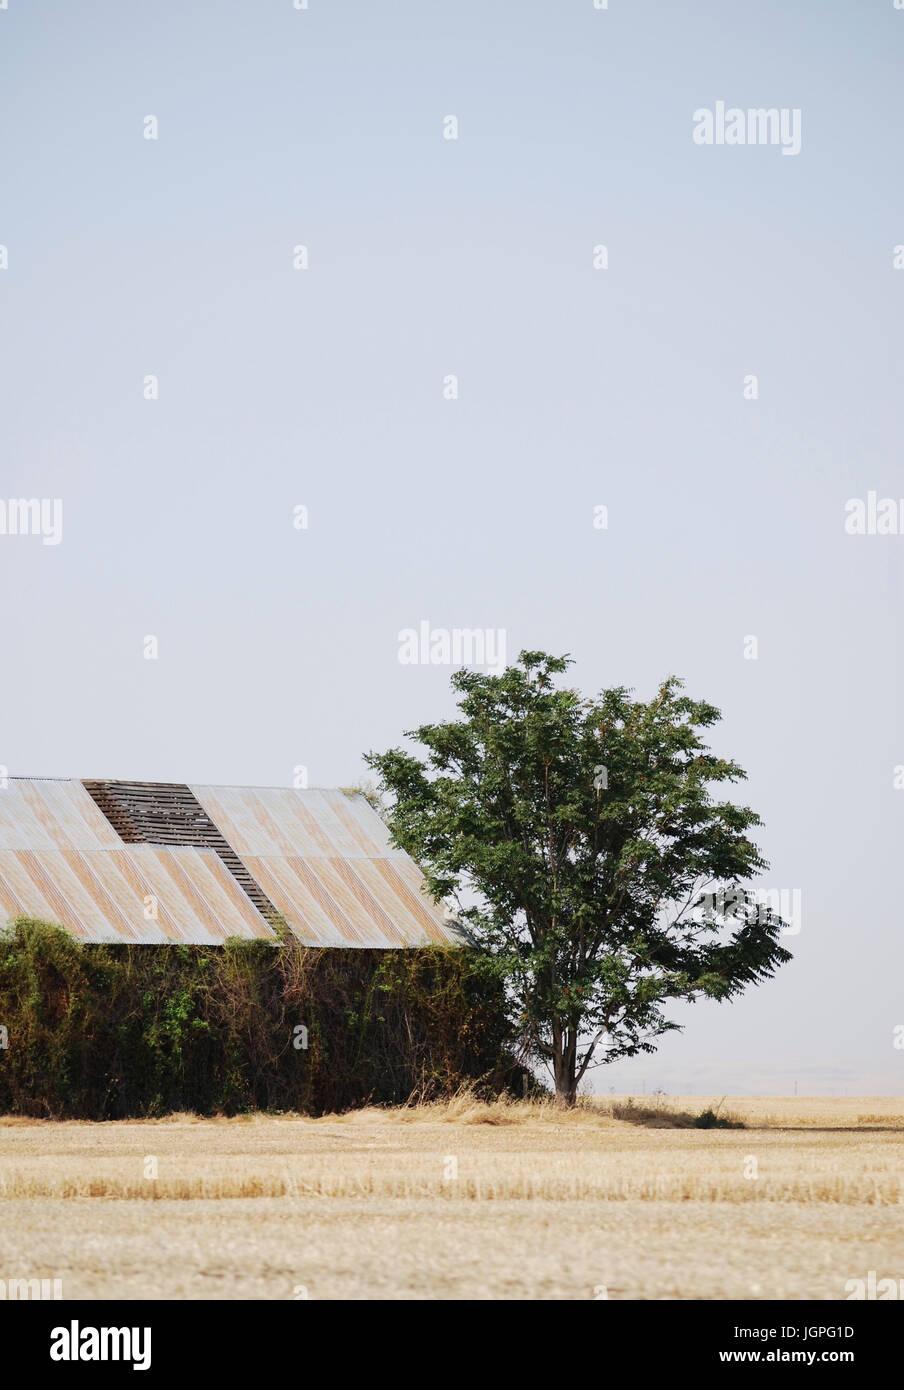 Rustic Barn and pasture fields, Walla Walla Wa, USA Landscape in Summer - Stock Image